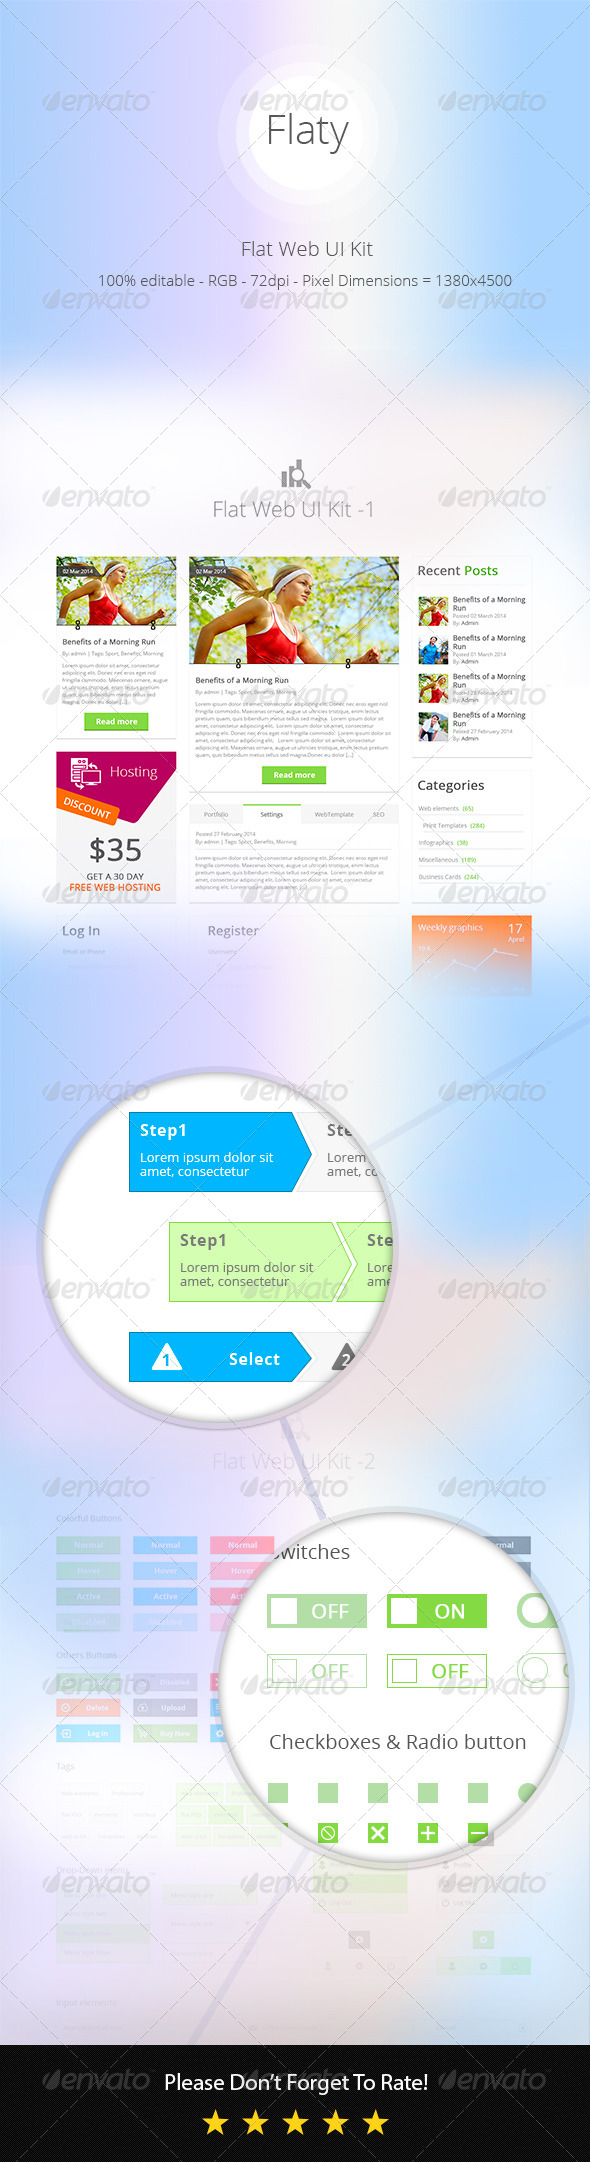 GraphicRiver Flat Web UI Kit 7513284